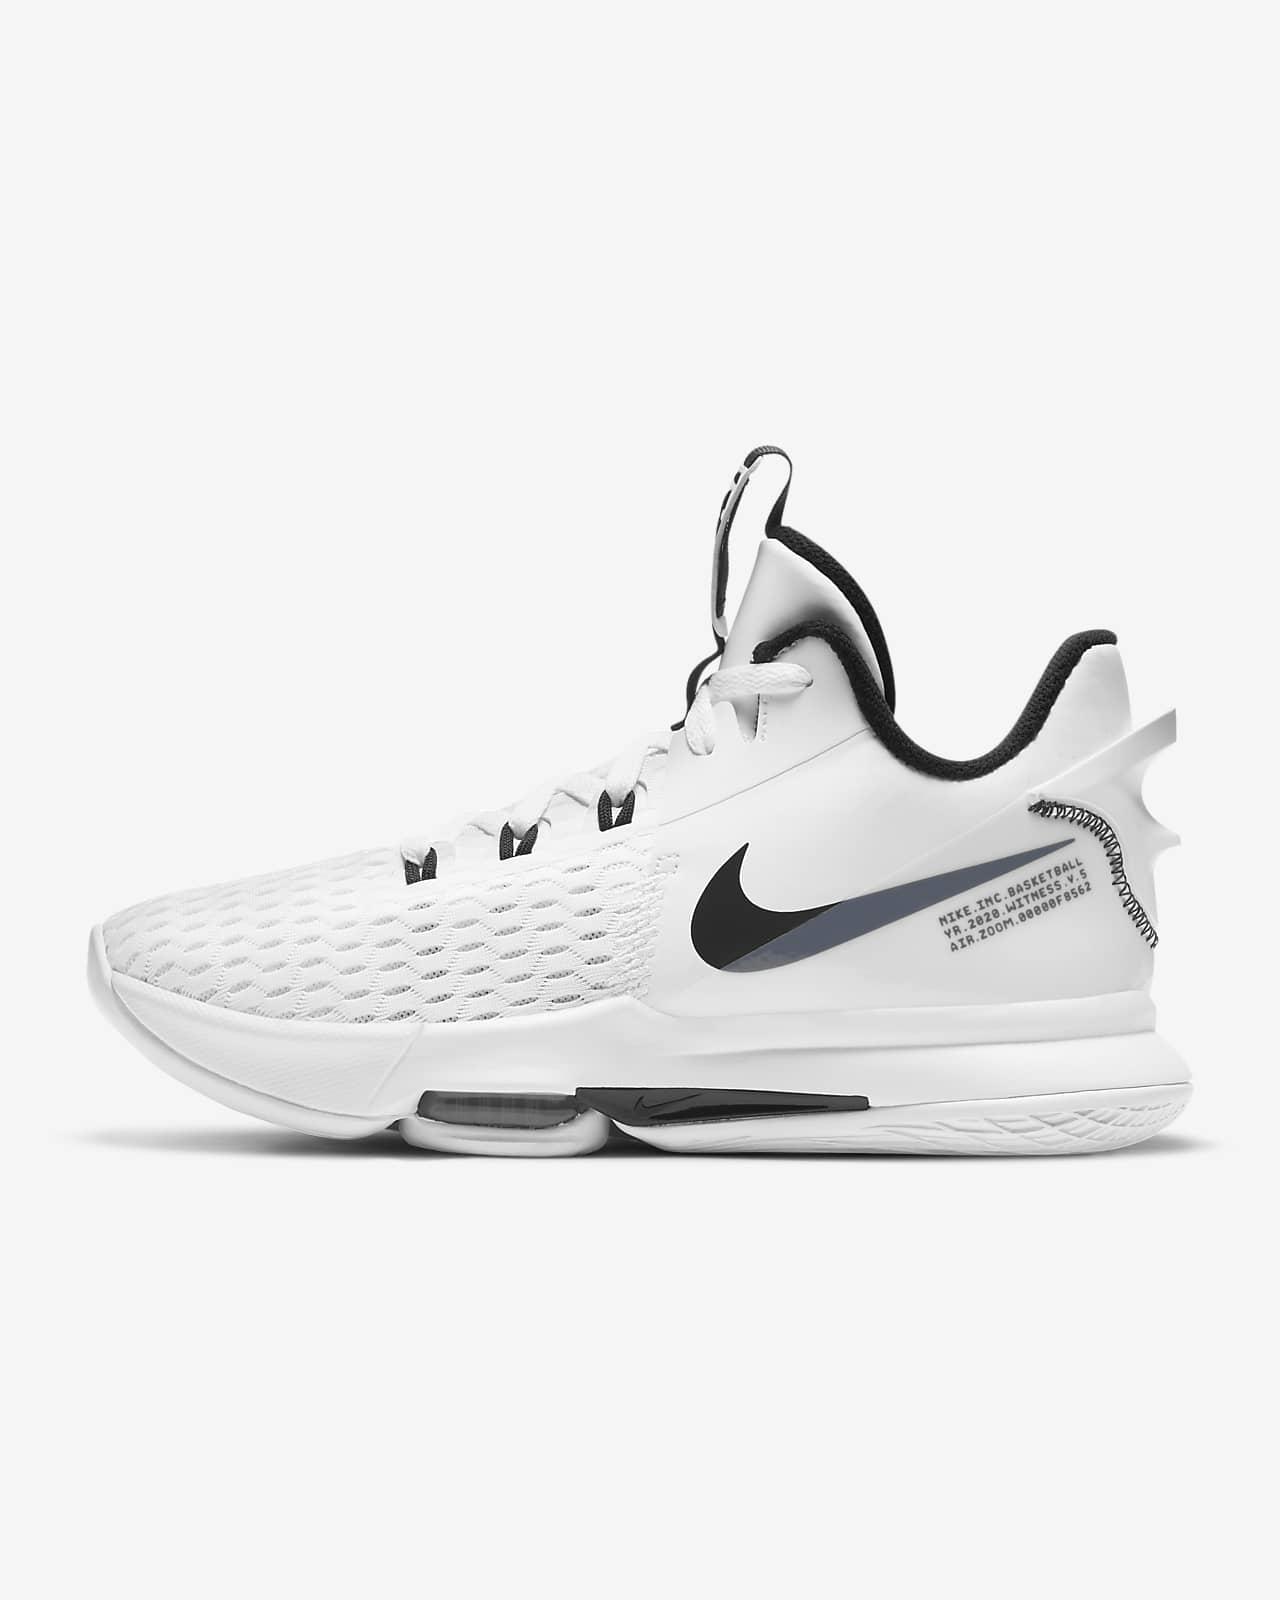 Calzado de básquetbol LeBron Witness 5